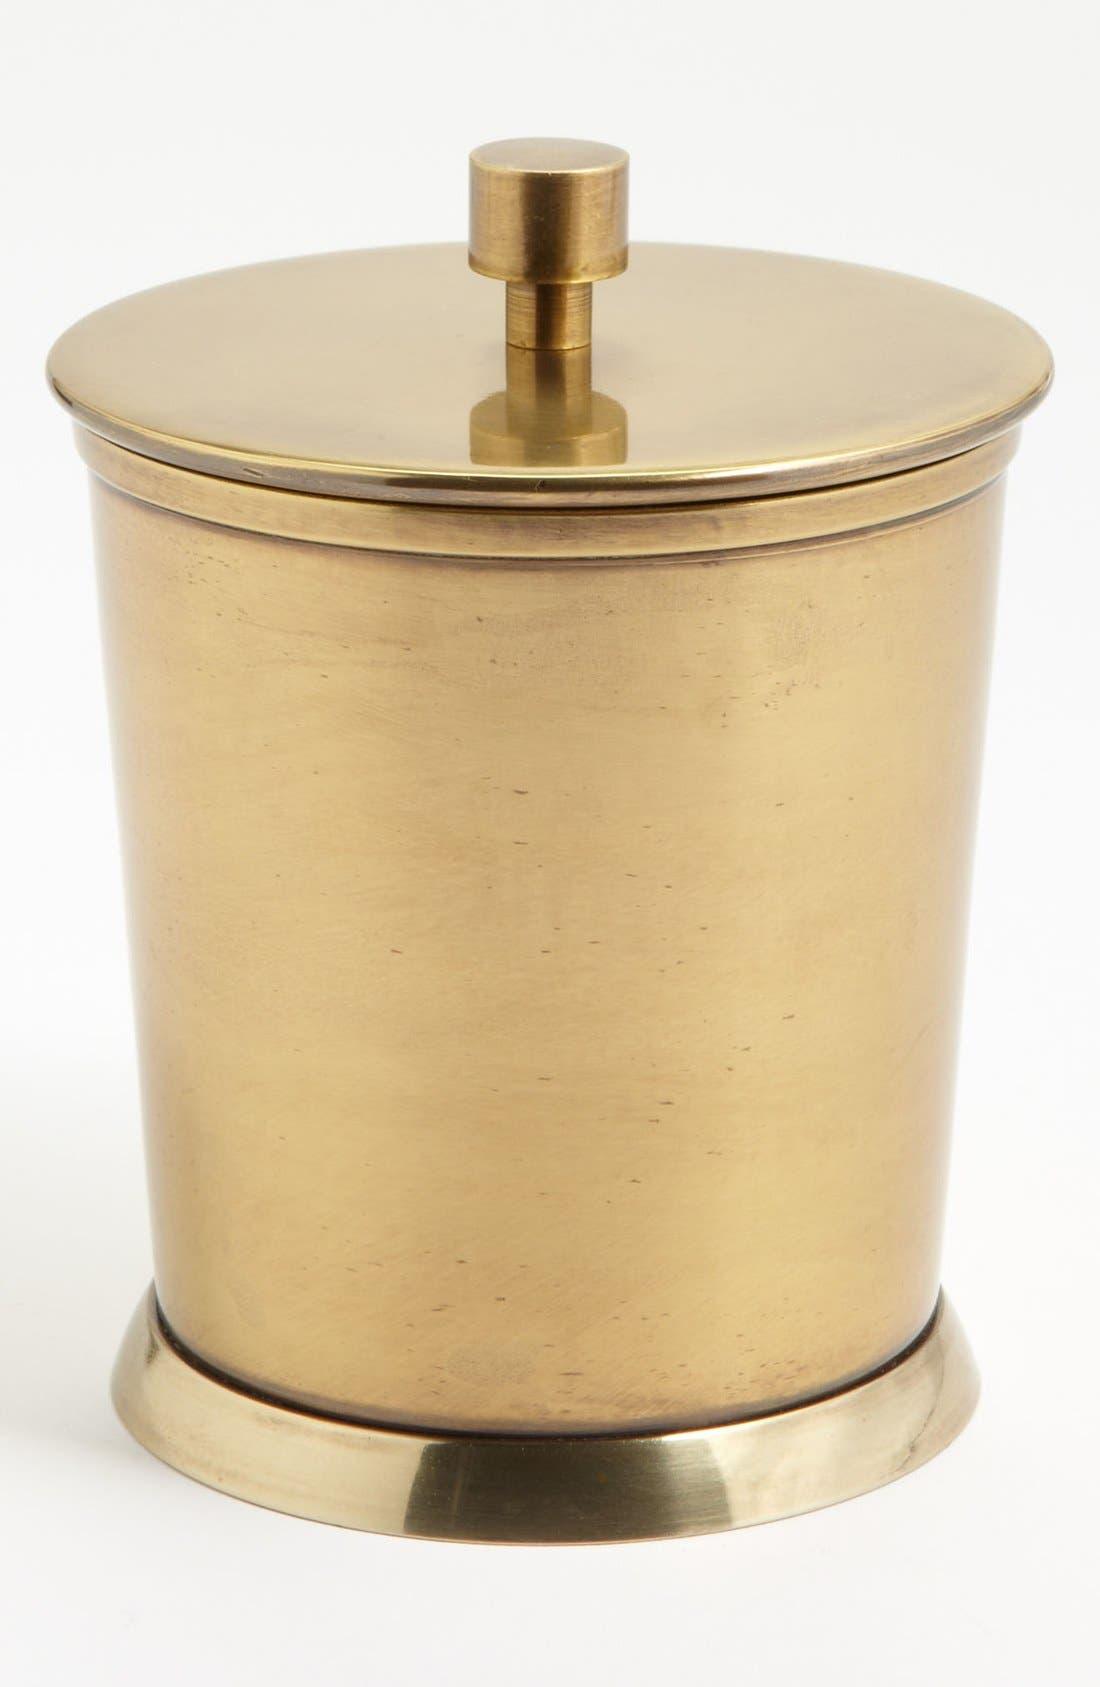 Waterworks Studio 'Wallingford' Covered Jar (Online Only)